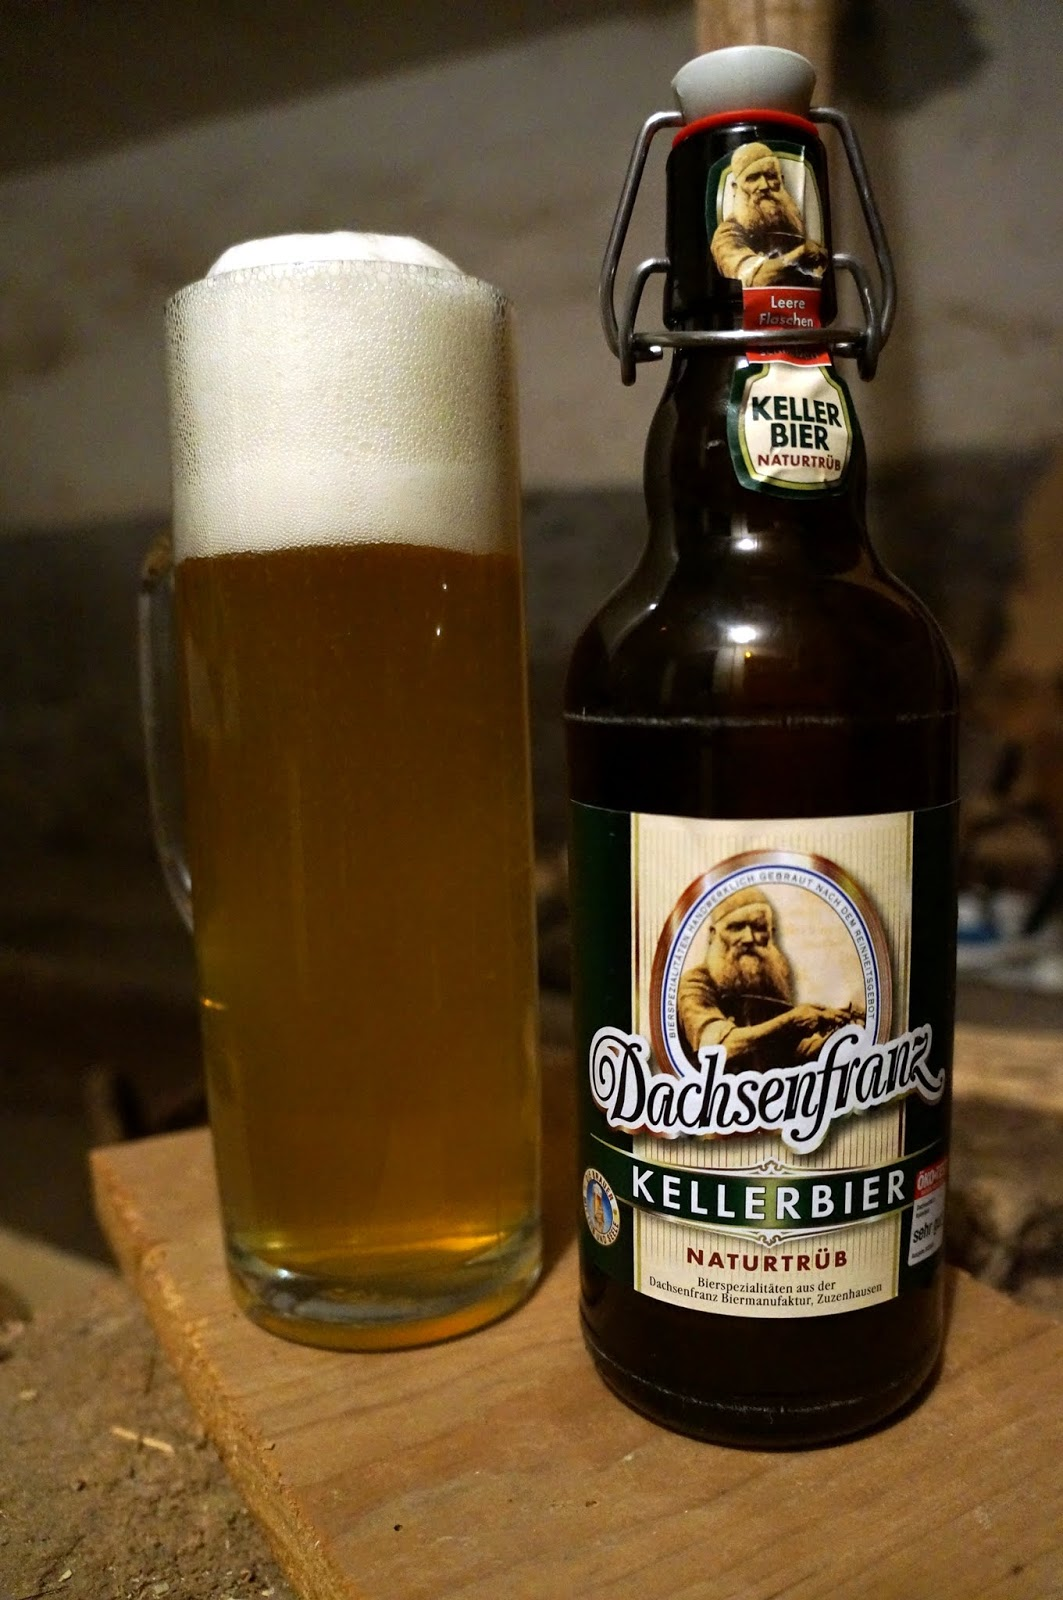 Beer Gesser: manufacturer, photo, reviews 25